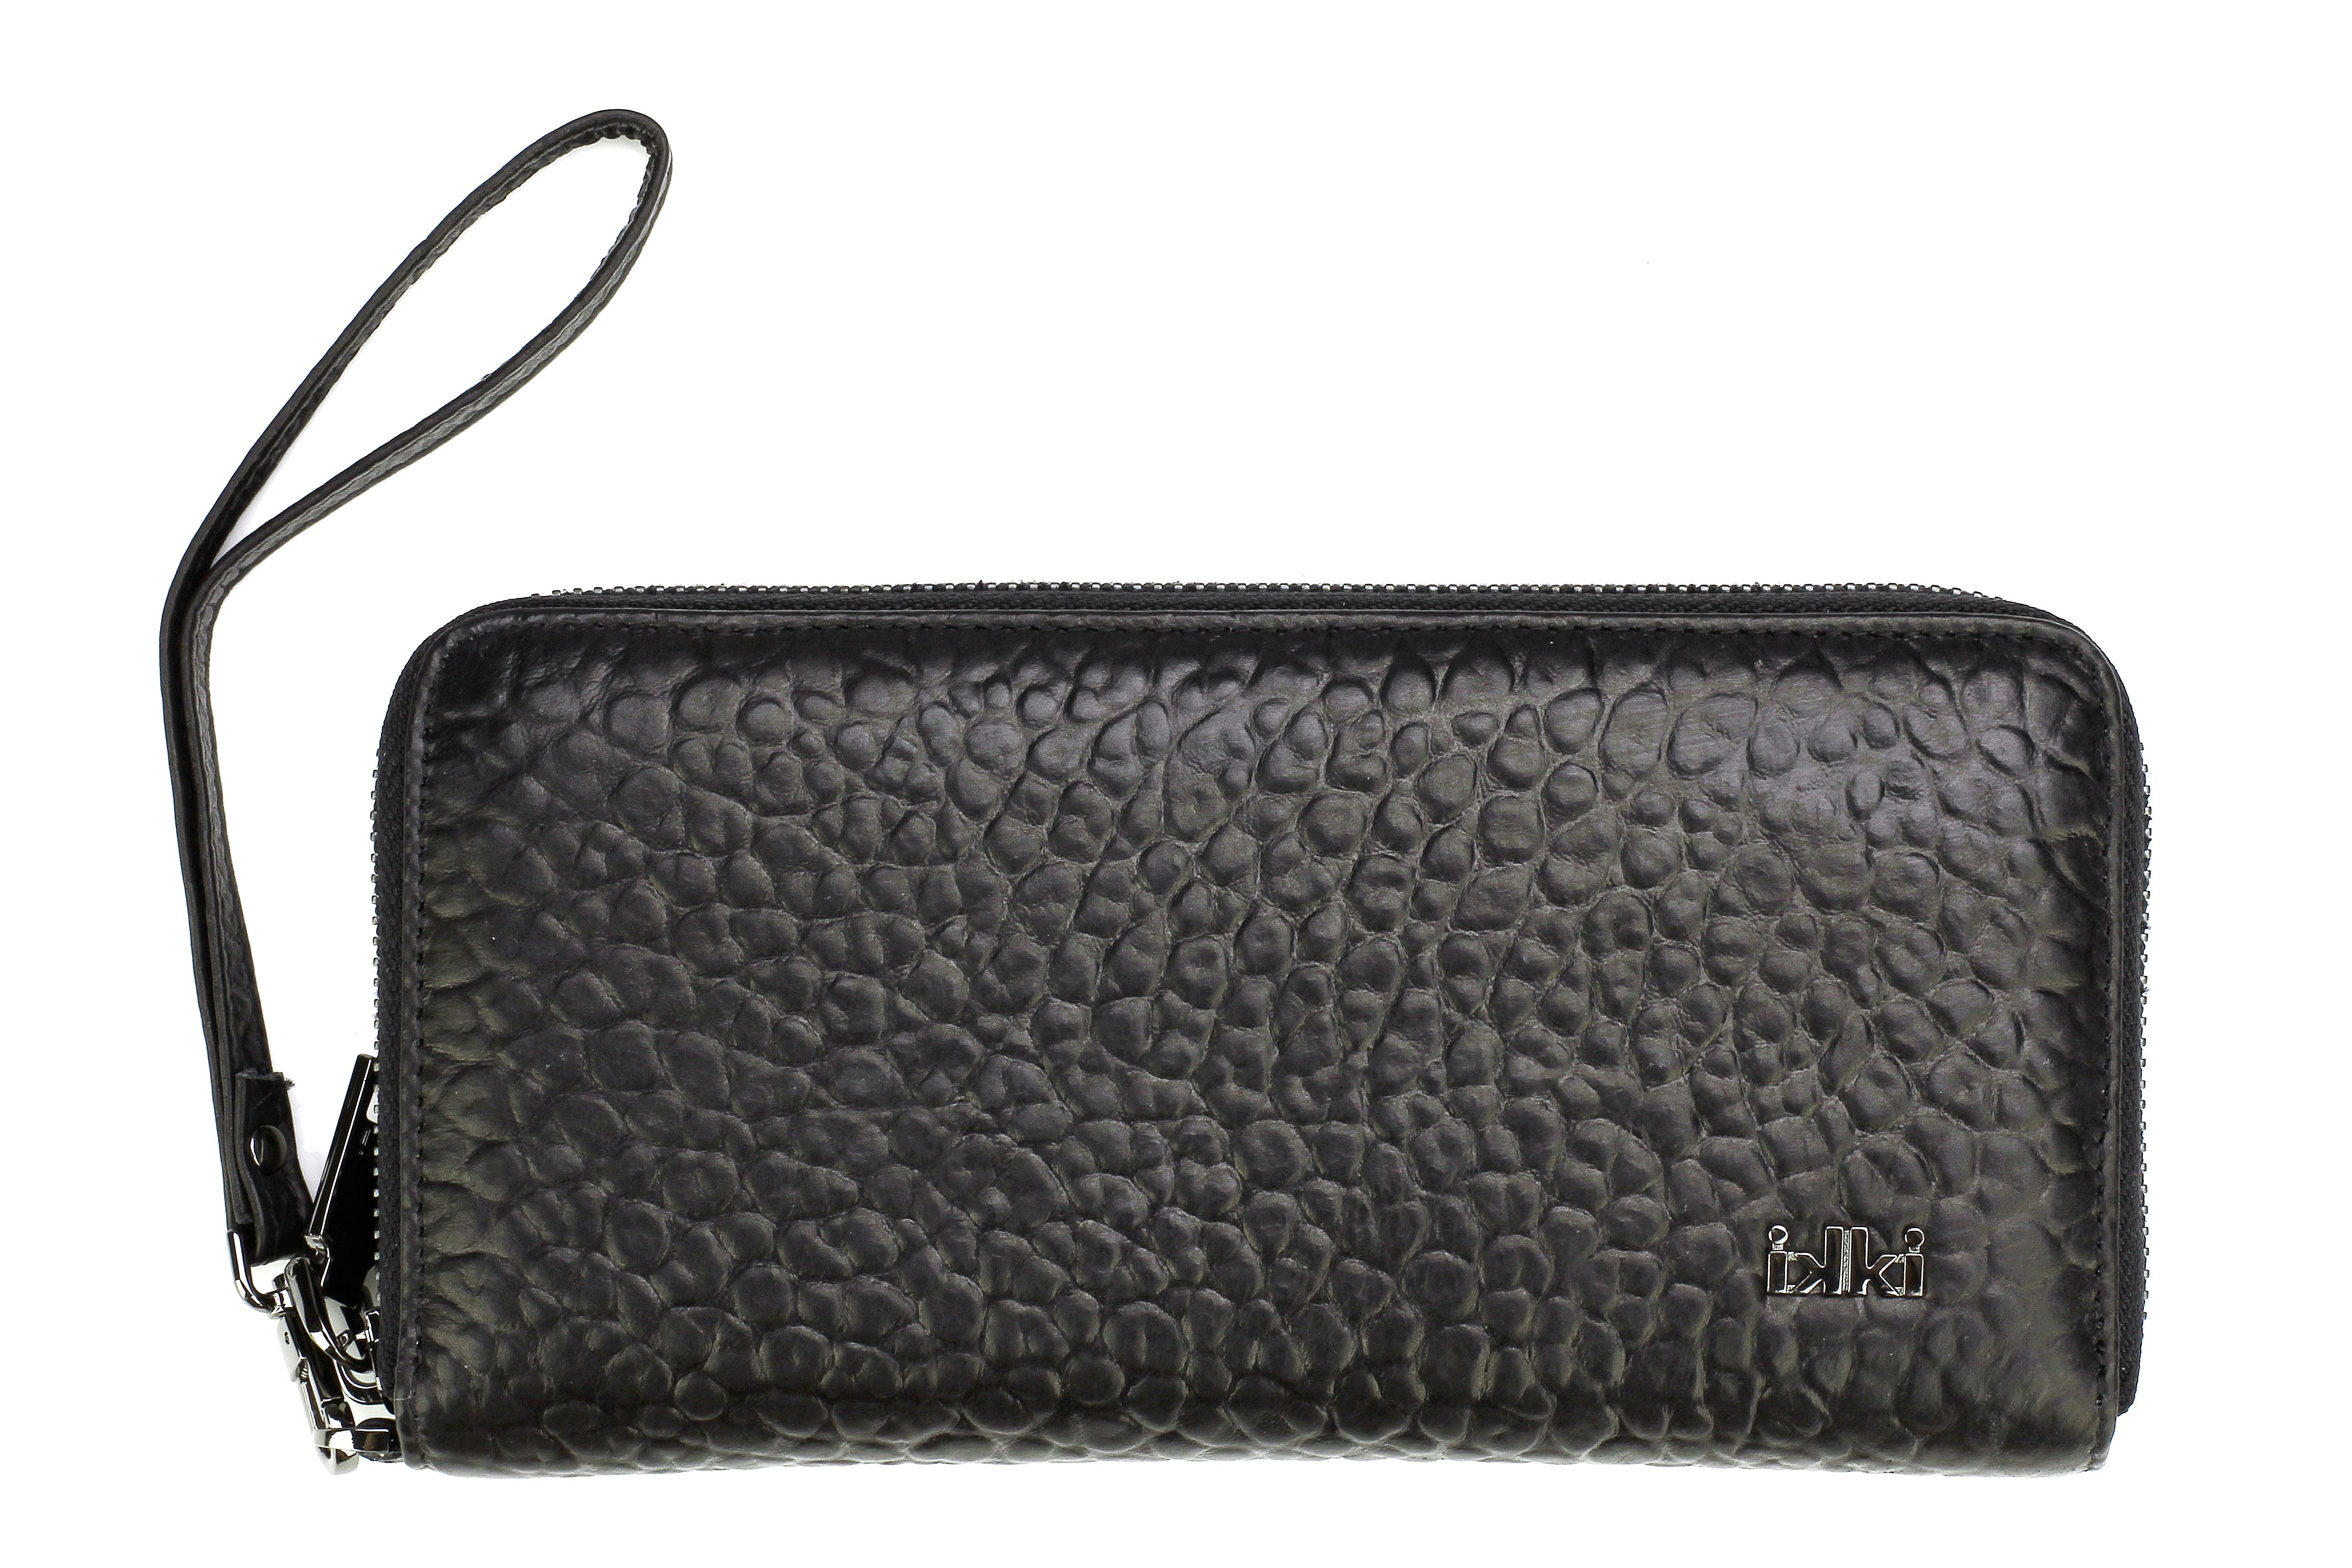 0cabb677923 portemonnee Cameron, black, zwart, leer, leather, special edition, october,